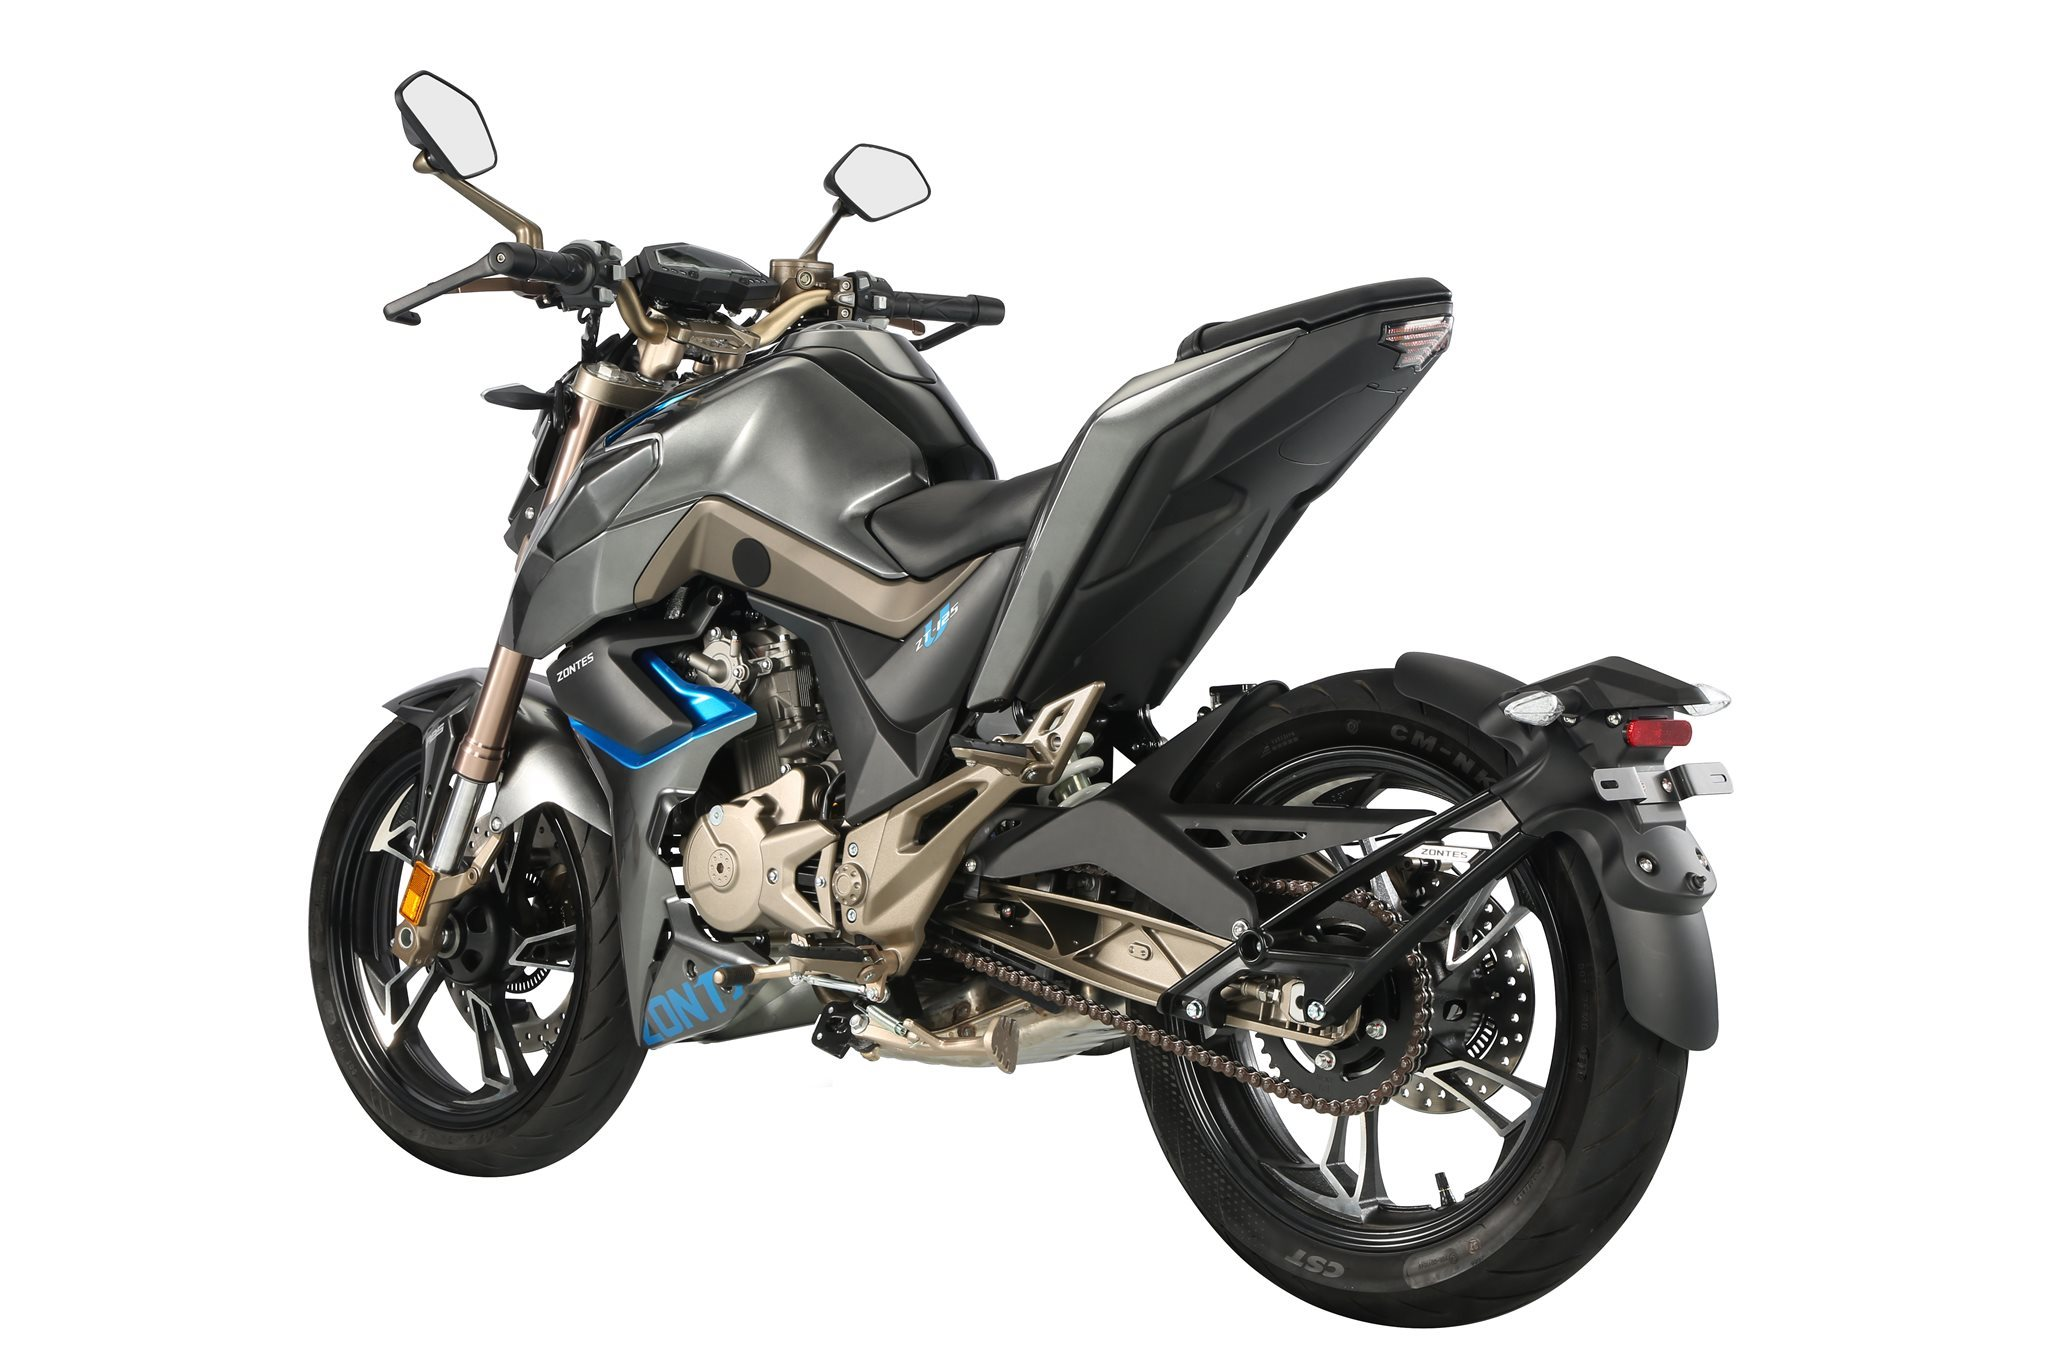 Neumotorrad: Zontes ZT 125-G1, Baujahr: 2021, 3.300,00 EUR